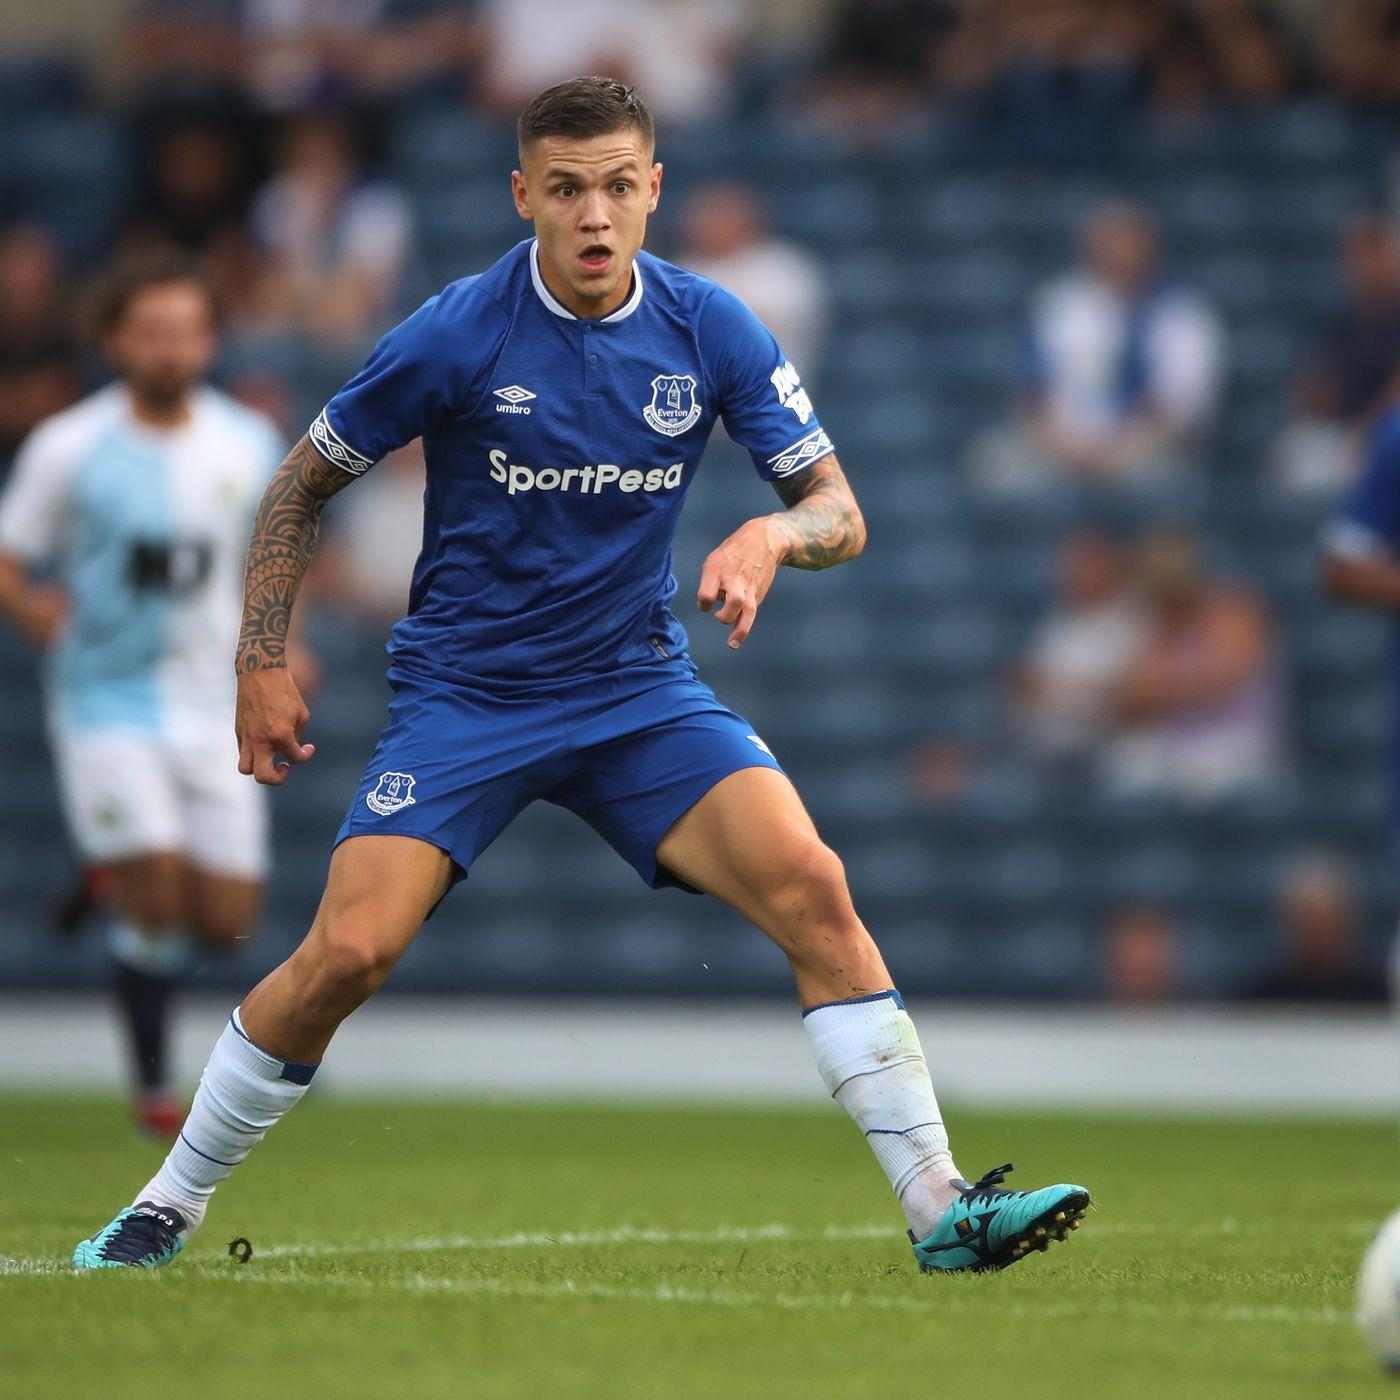 CONFIRMED: Muhamed Besic leaves for Sheffield United - Royal Blue Mersey